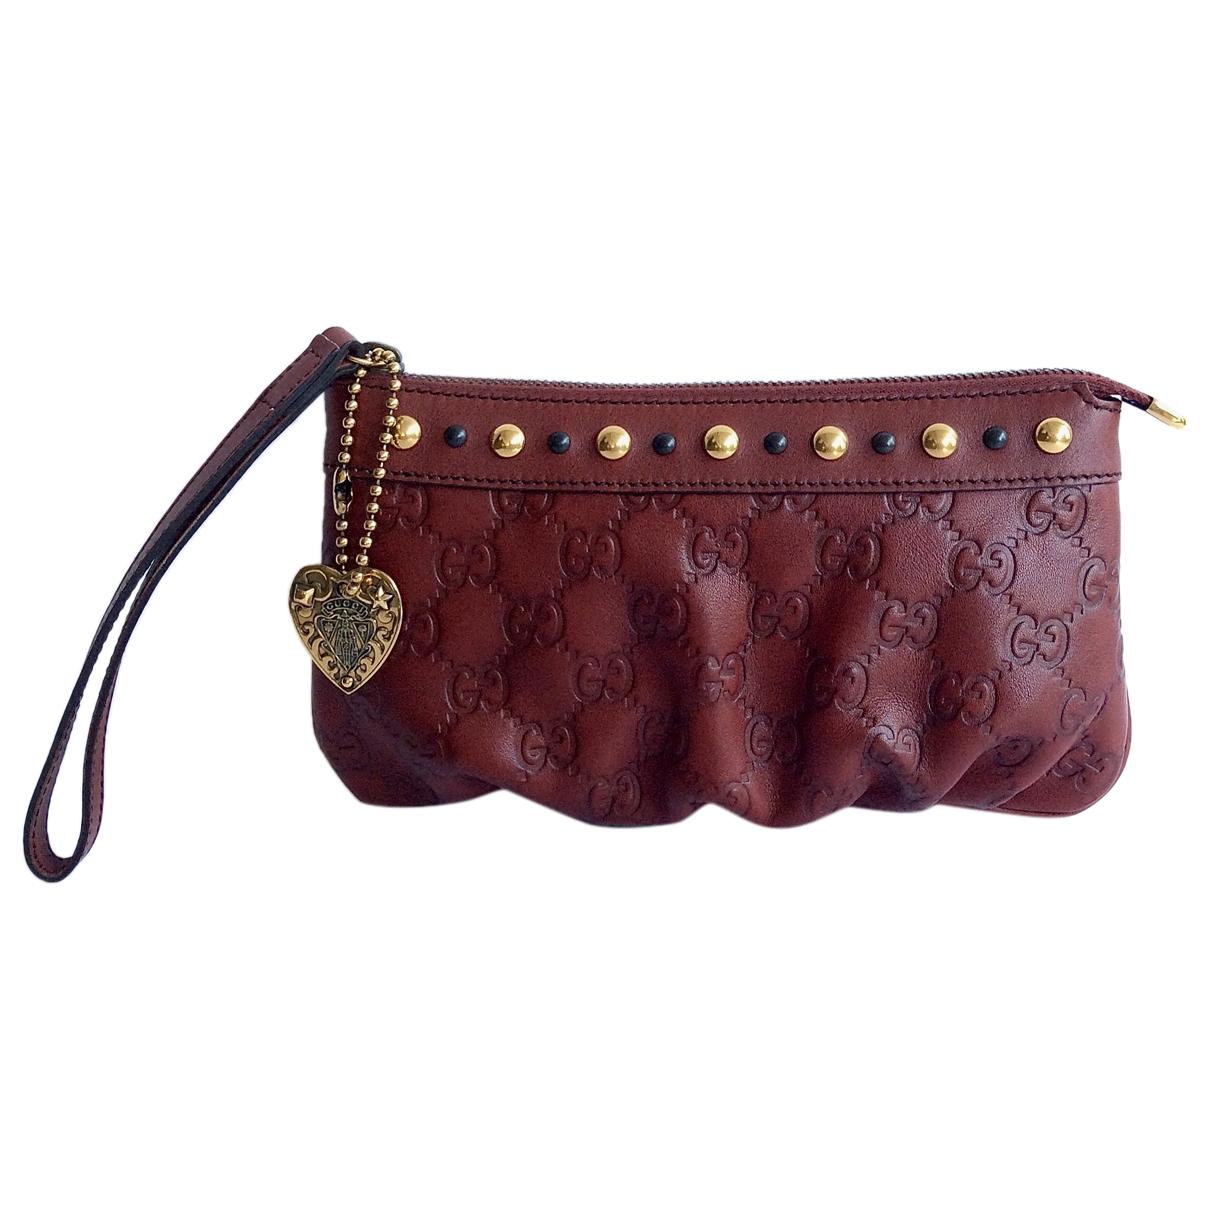 Gucci Hysteria Burgundy Leather Clutch bag for Women \N